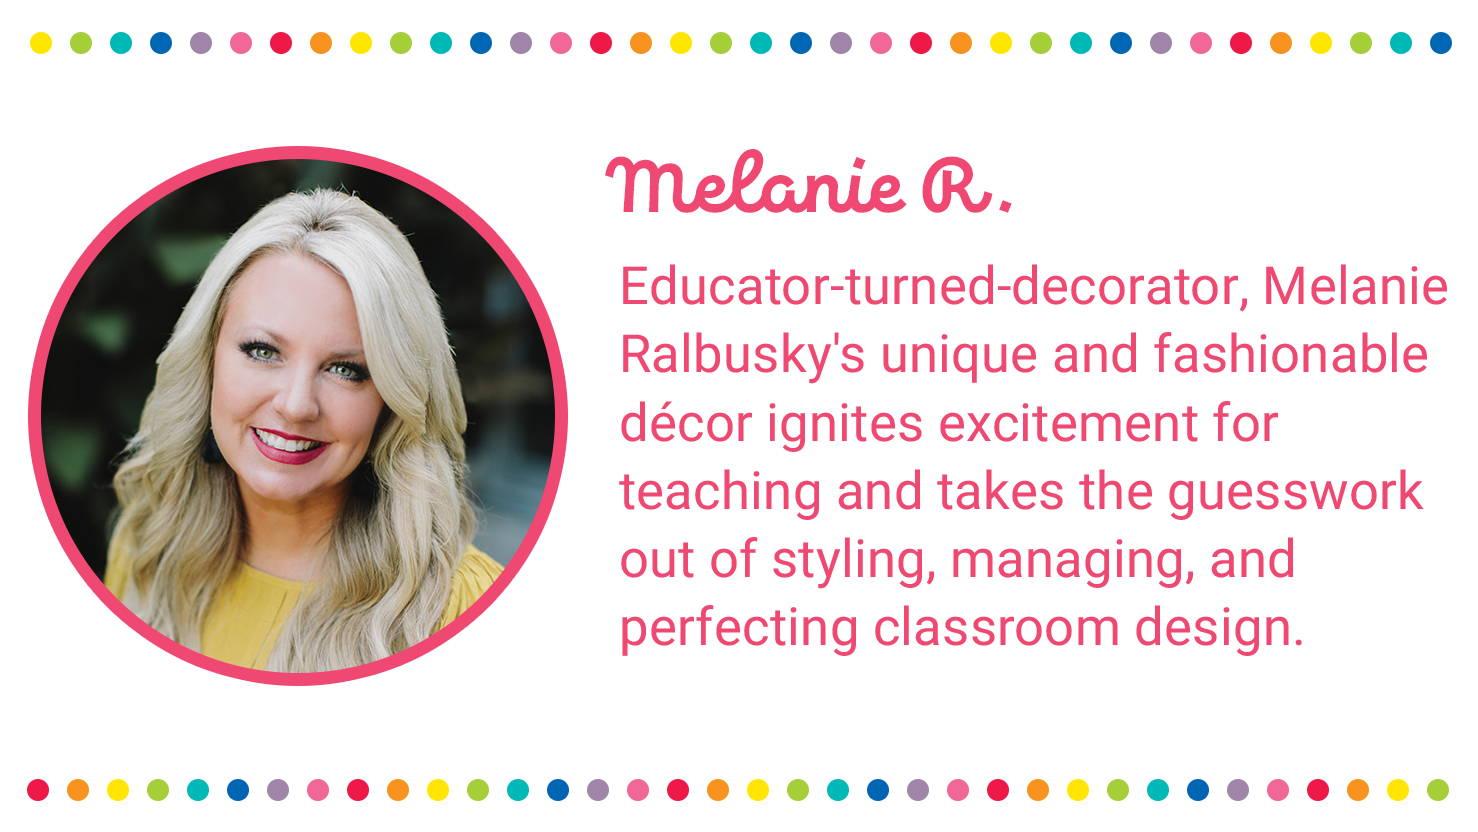 Melanie Ralbusky's Schoolgirl Style Classroom Decorations